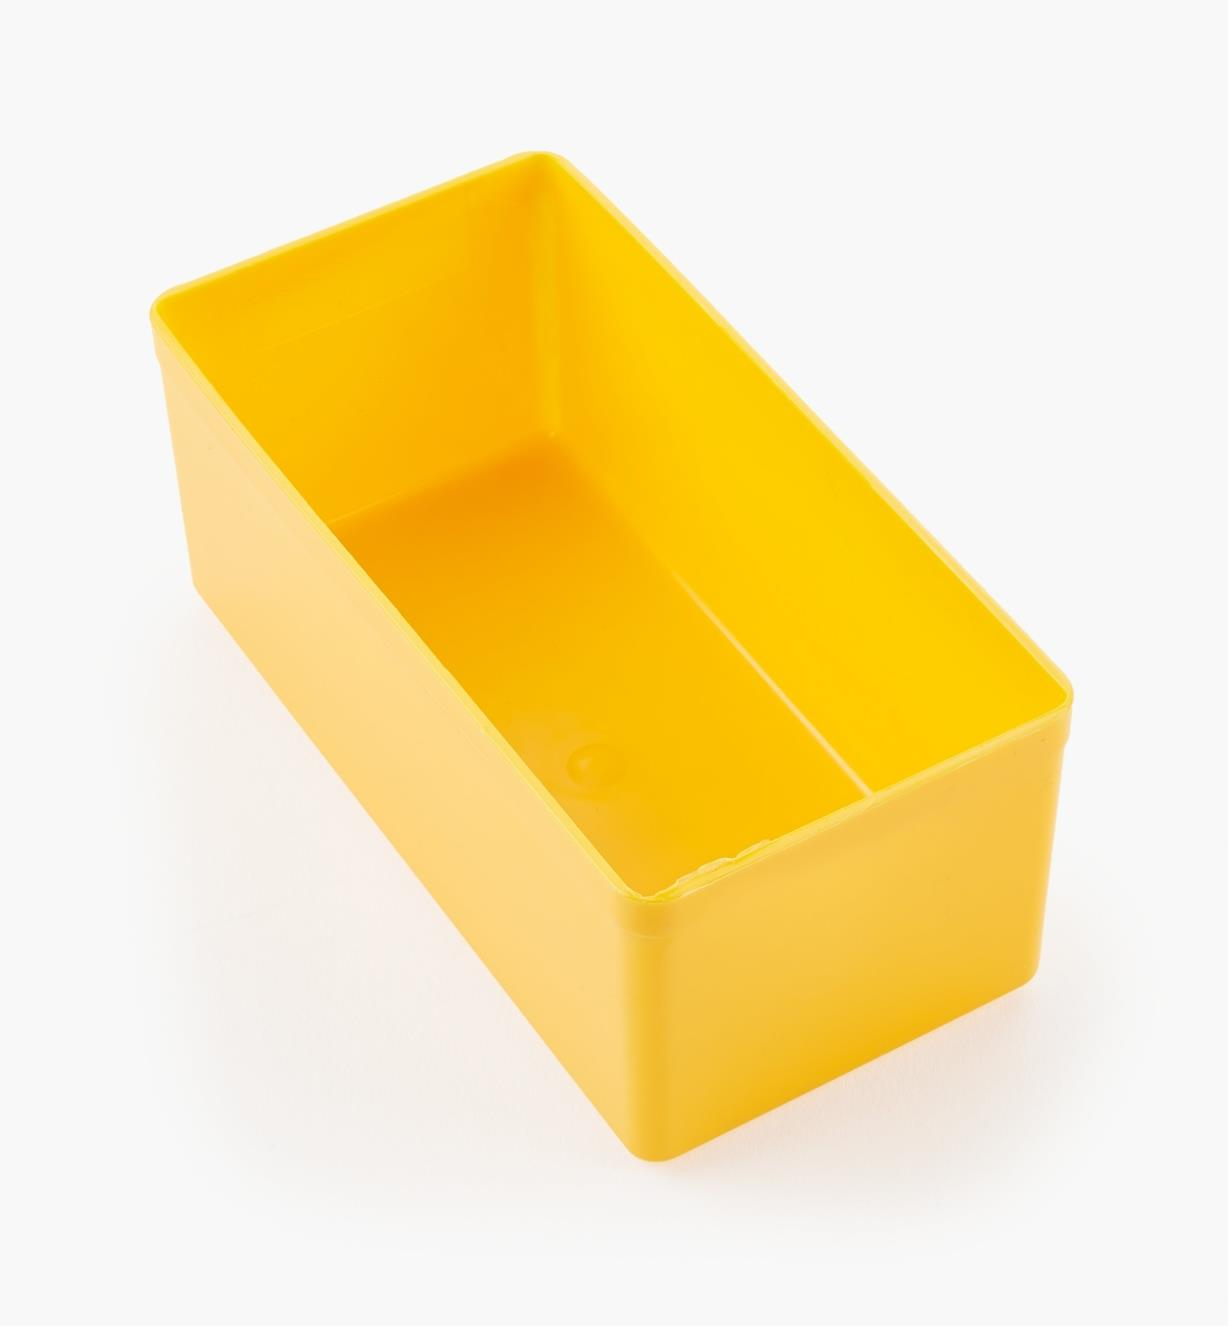 27K8012 - Godet jaune de 43 mm x 105 mm x 51 mm (1 11/16 po x 4 1/8 po x 2 po), l'unité